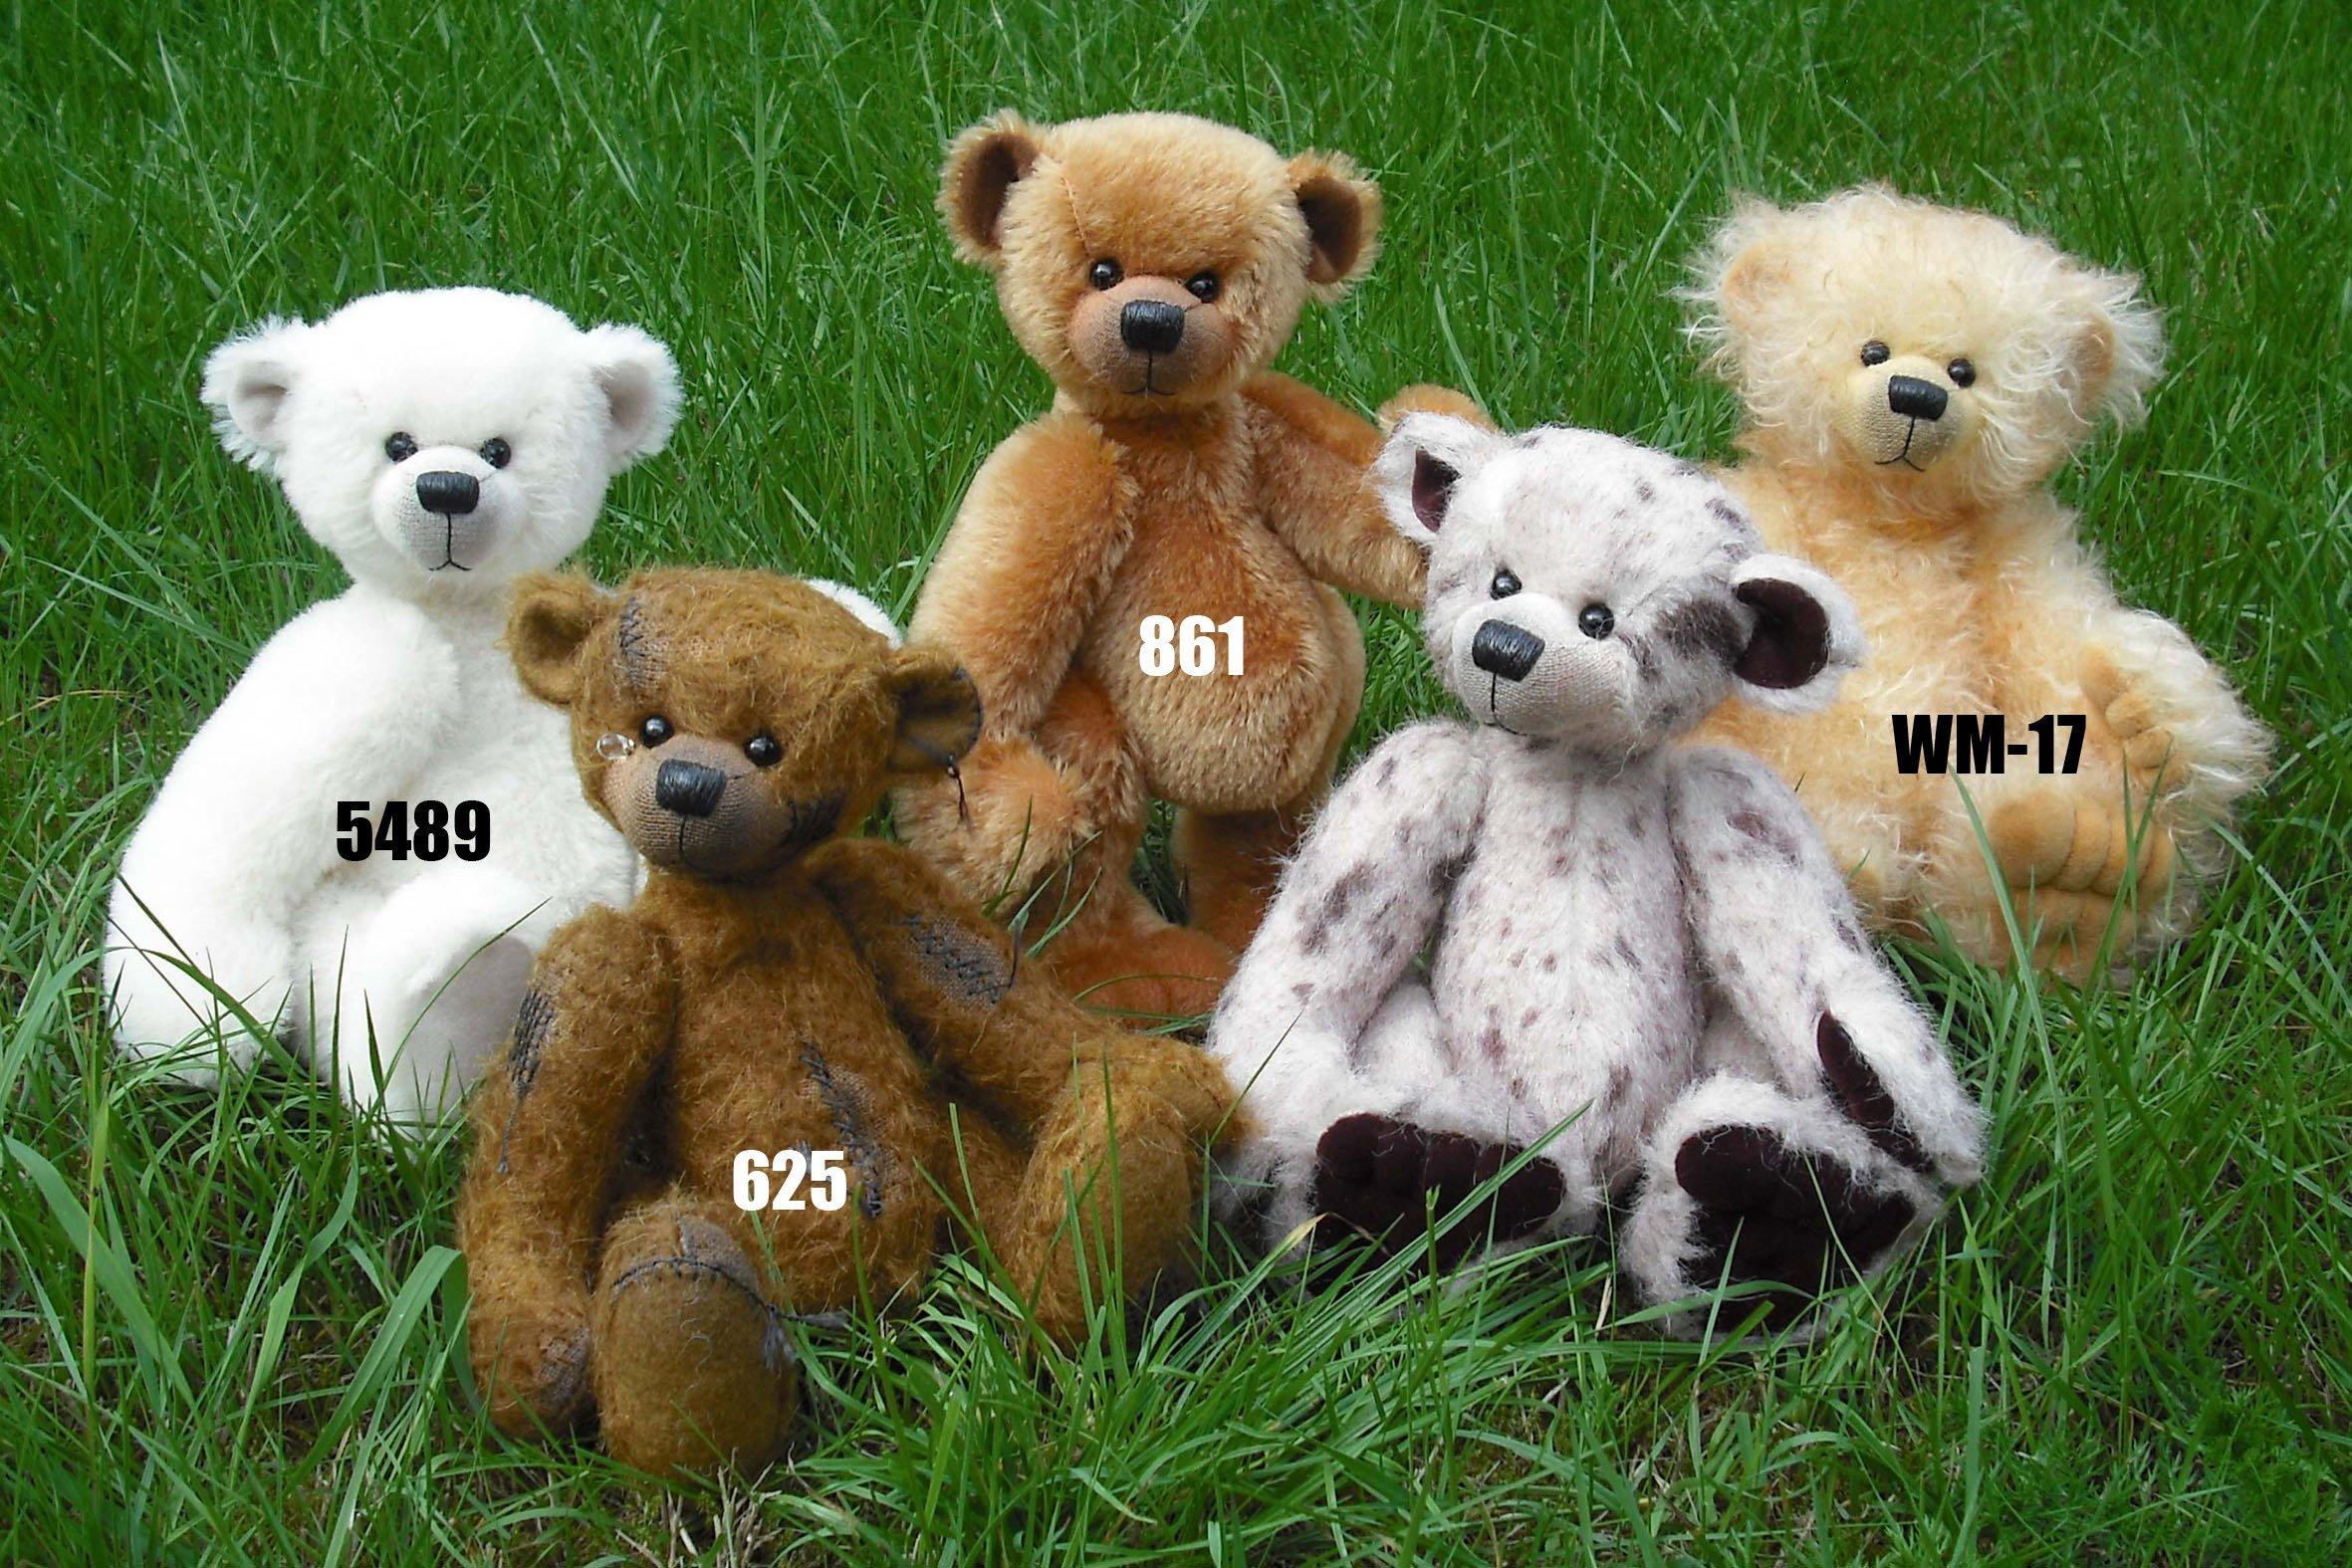 Teddy Bear ''Wilja'' ± 9 Inches - SEW IT YOURSELF KIT (625)